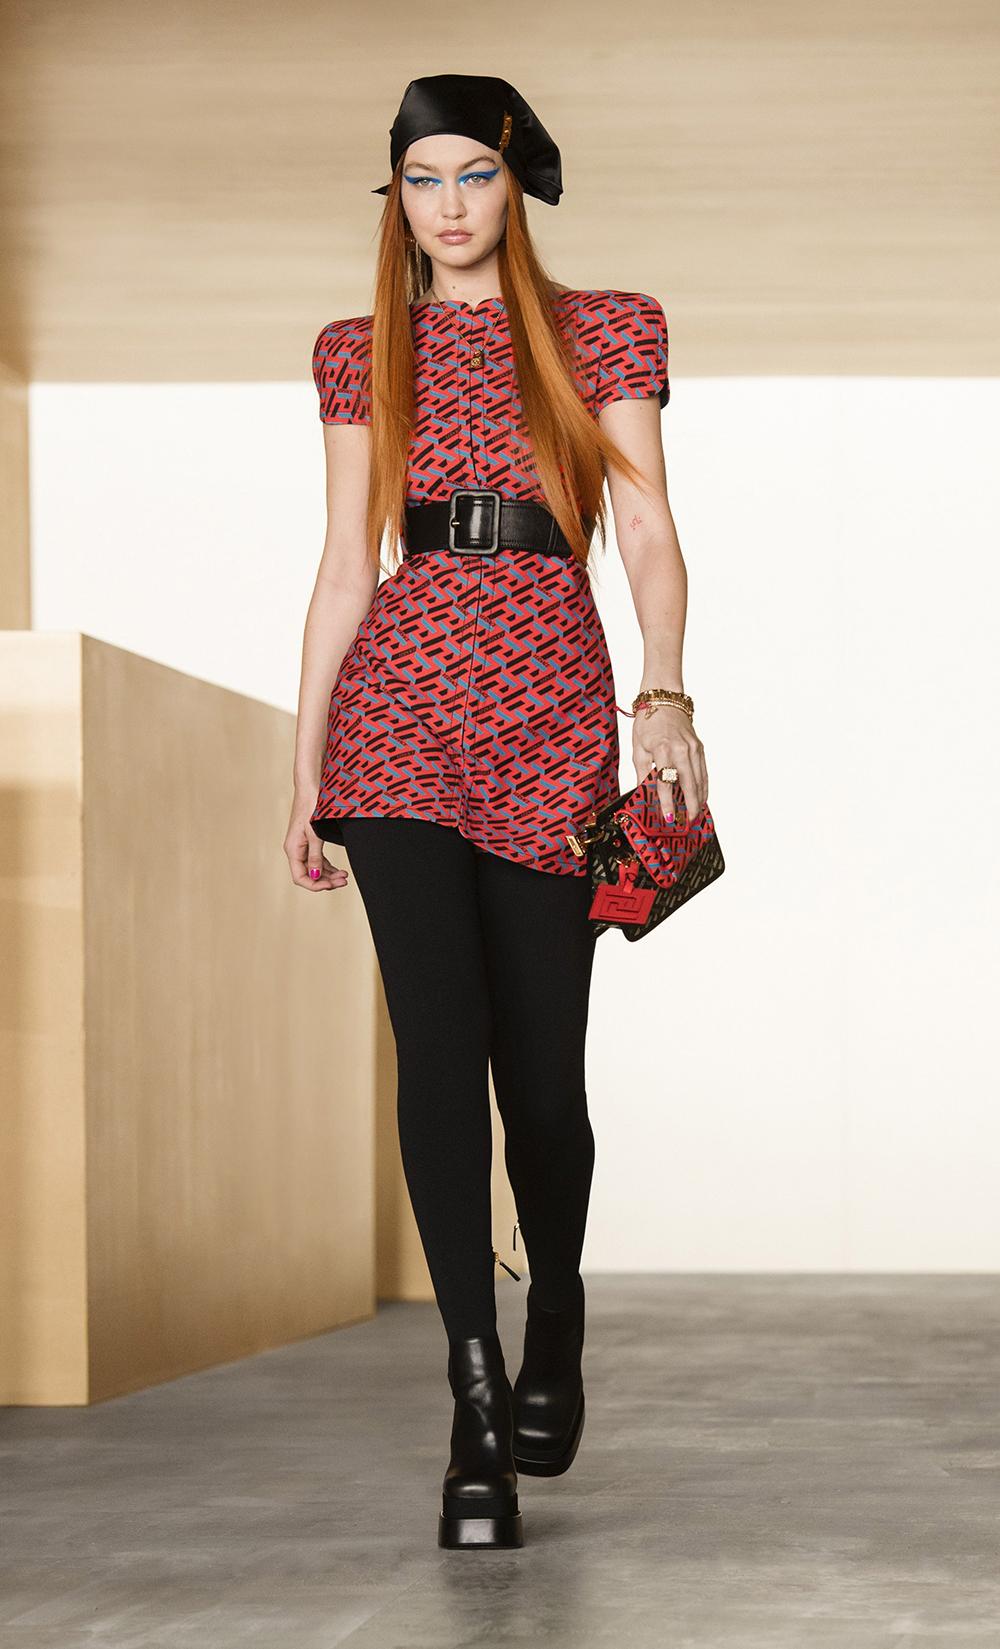 Best MFW Looks I Gigi Hadid walks Versace Fall 2021 collection runway #milanfashionweek #fallfashion #fashionstyle #fashionblog